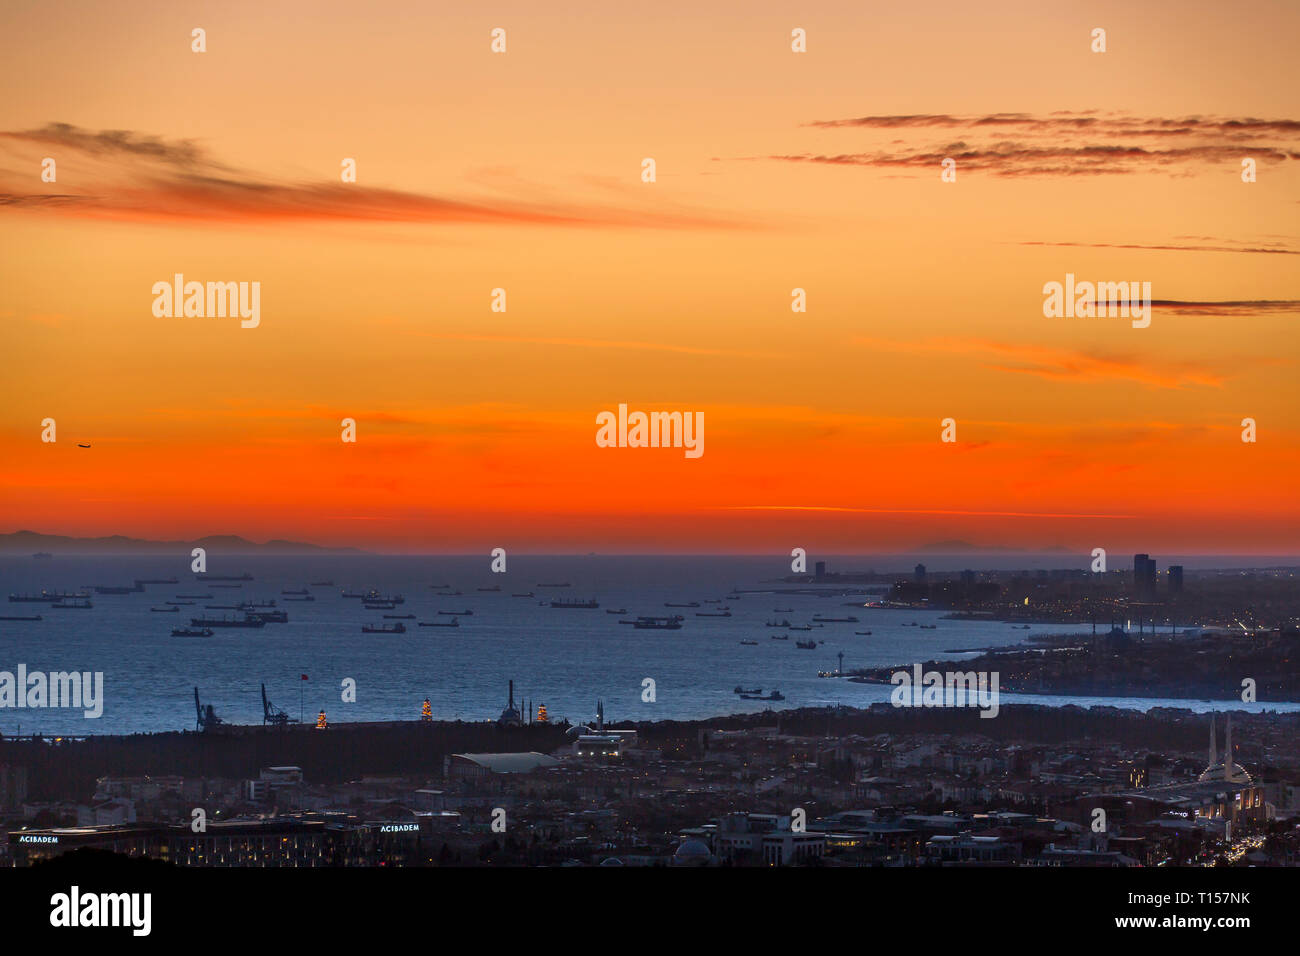 Istanbul, Turkey, 19 January 2018: Sunset of Bosphorus and ships on marmara sea - Stock Image